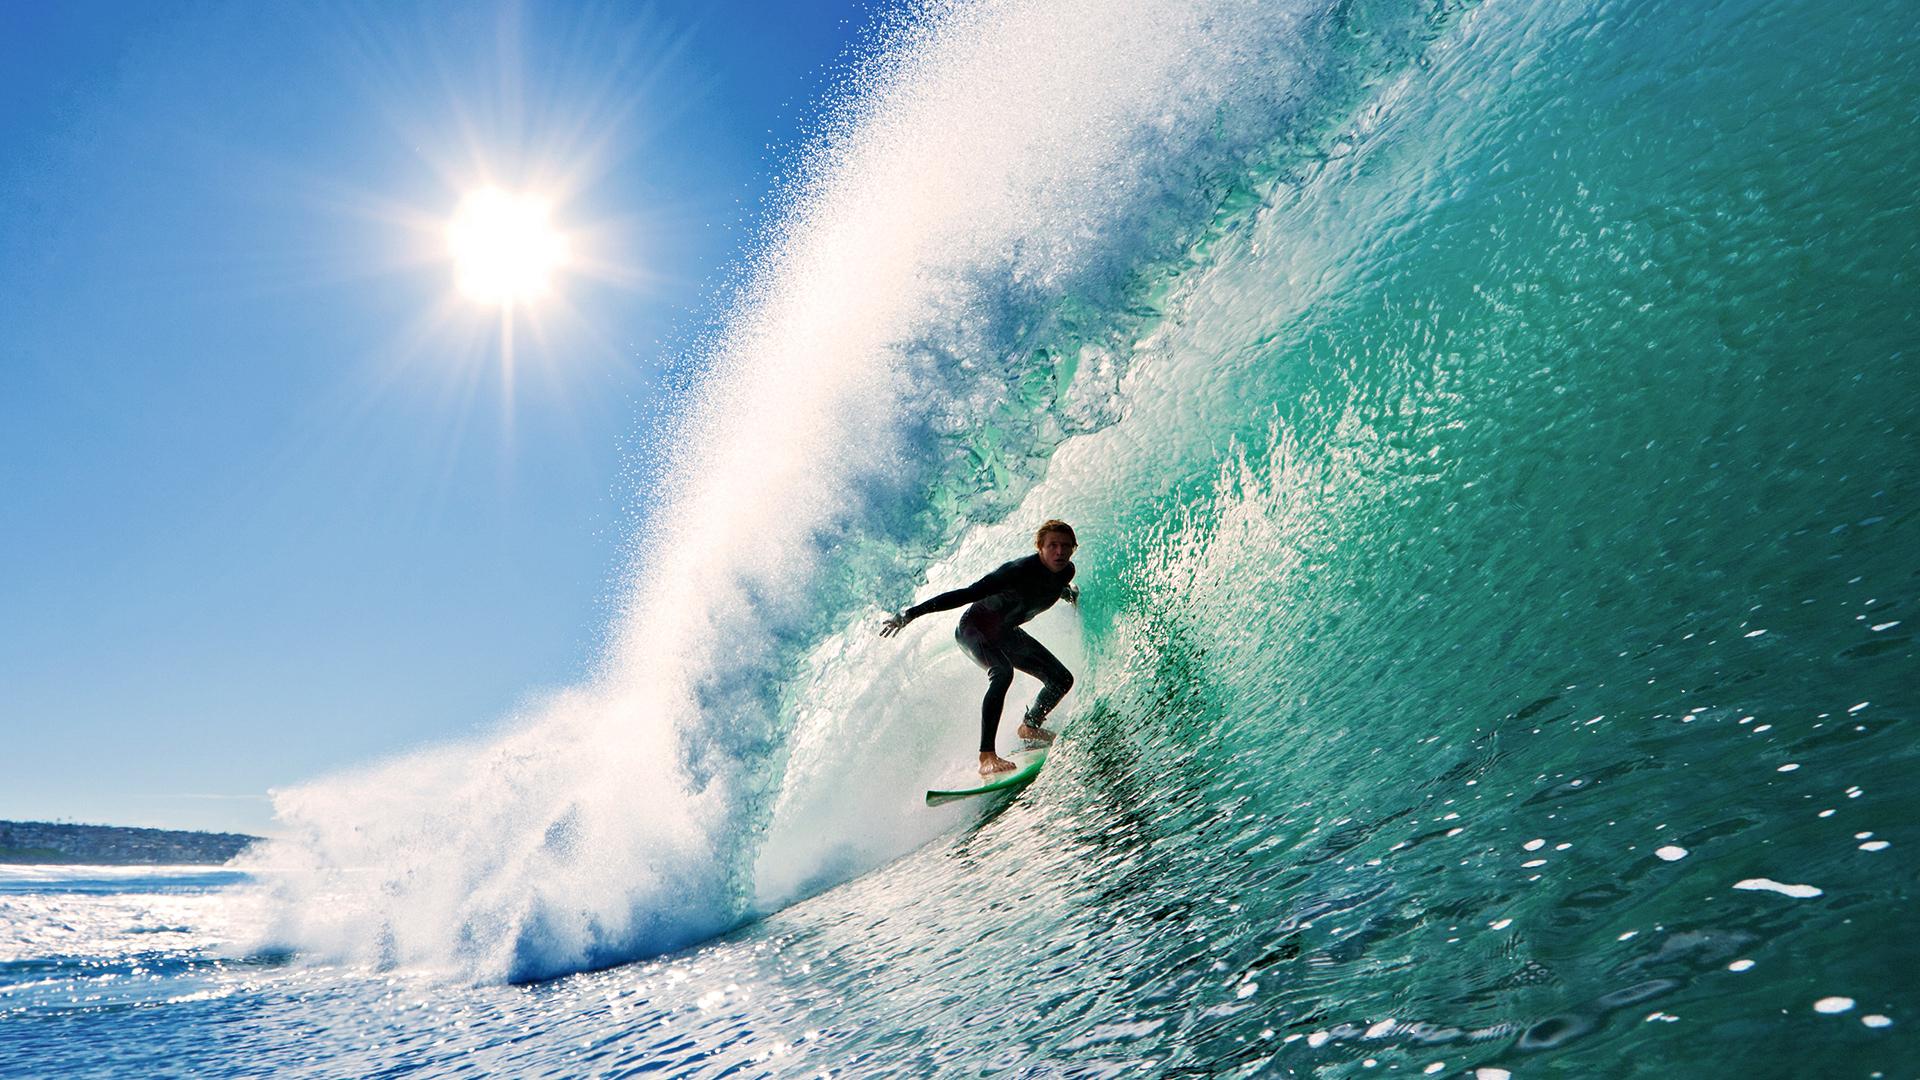 surf surfing top image surf water surfing picture surfer sport best ...